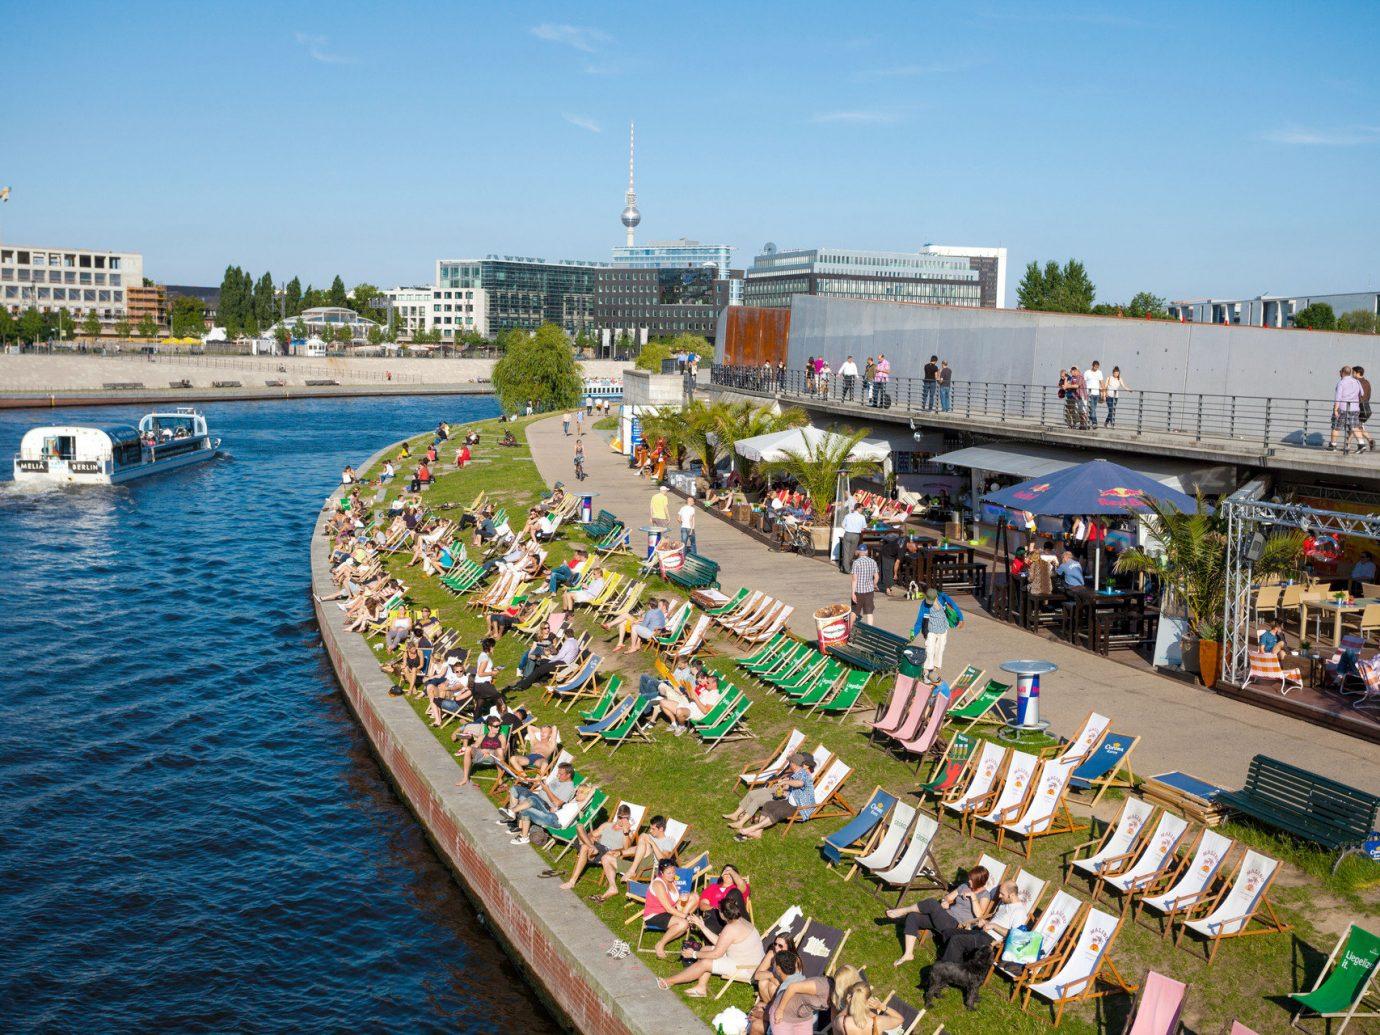 Berlin Germany Munich Trip Ideas sky water outdoor Boat walkway tourism waterway River boating endurance sports Water park boardwalk marina Harbor